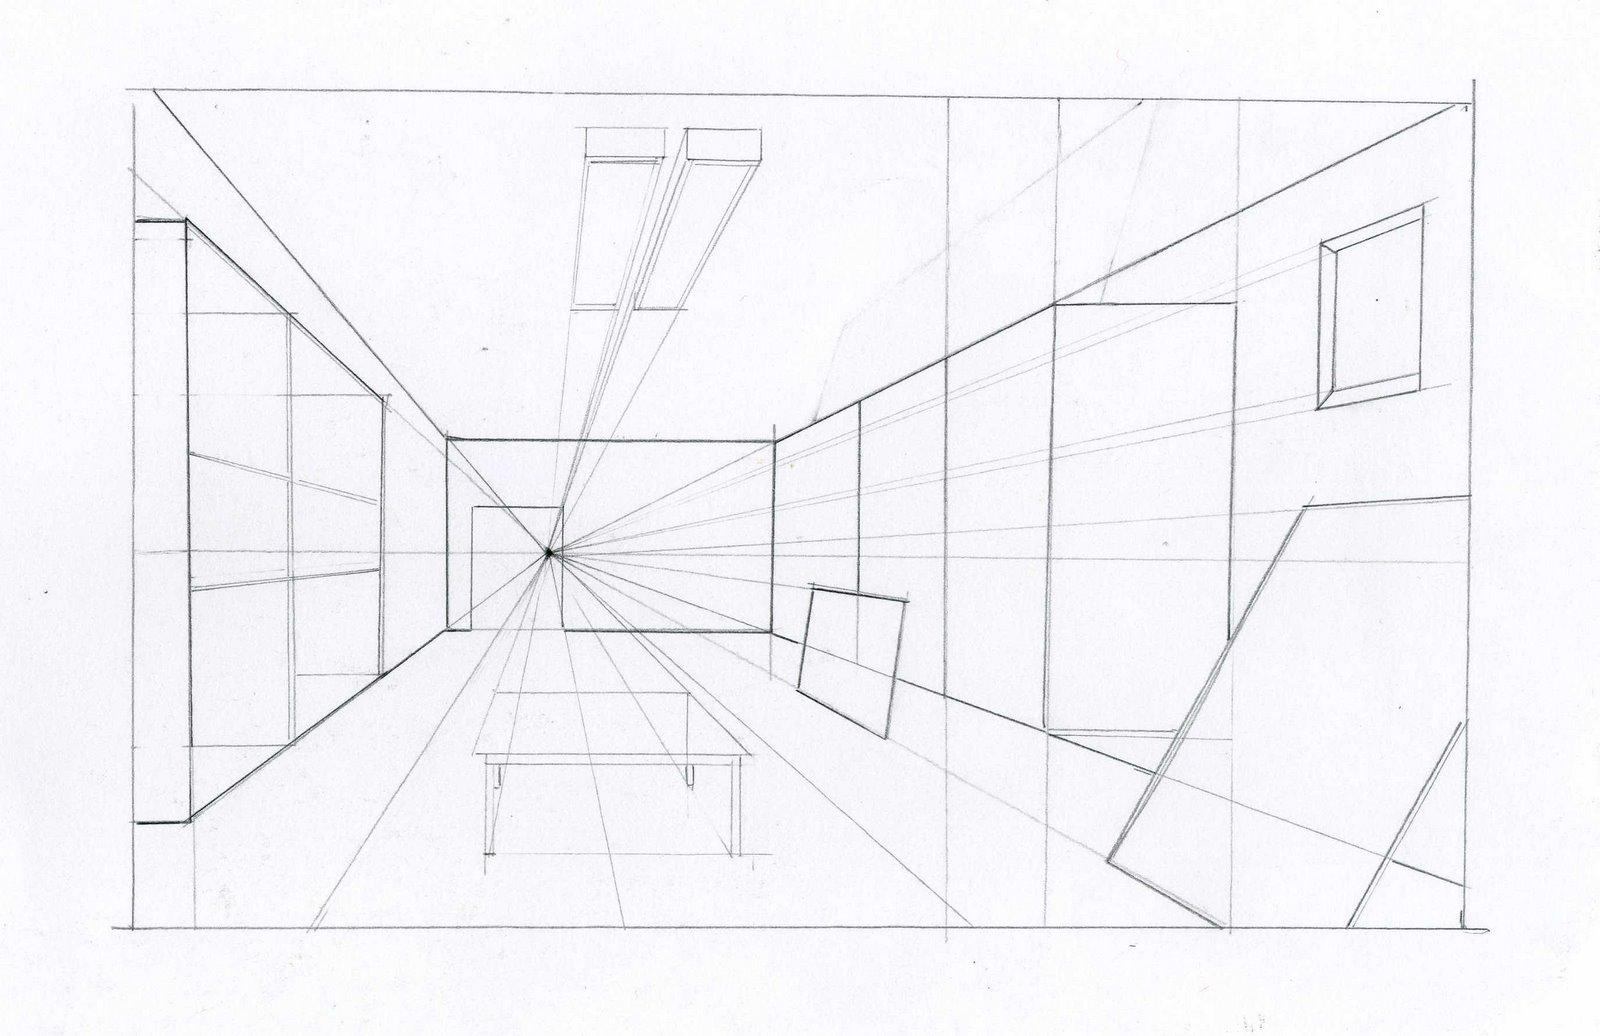 Geometria descriptiva fus septiembre 2010 for Exterior un punto de fuga